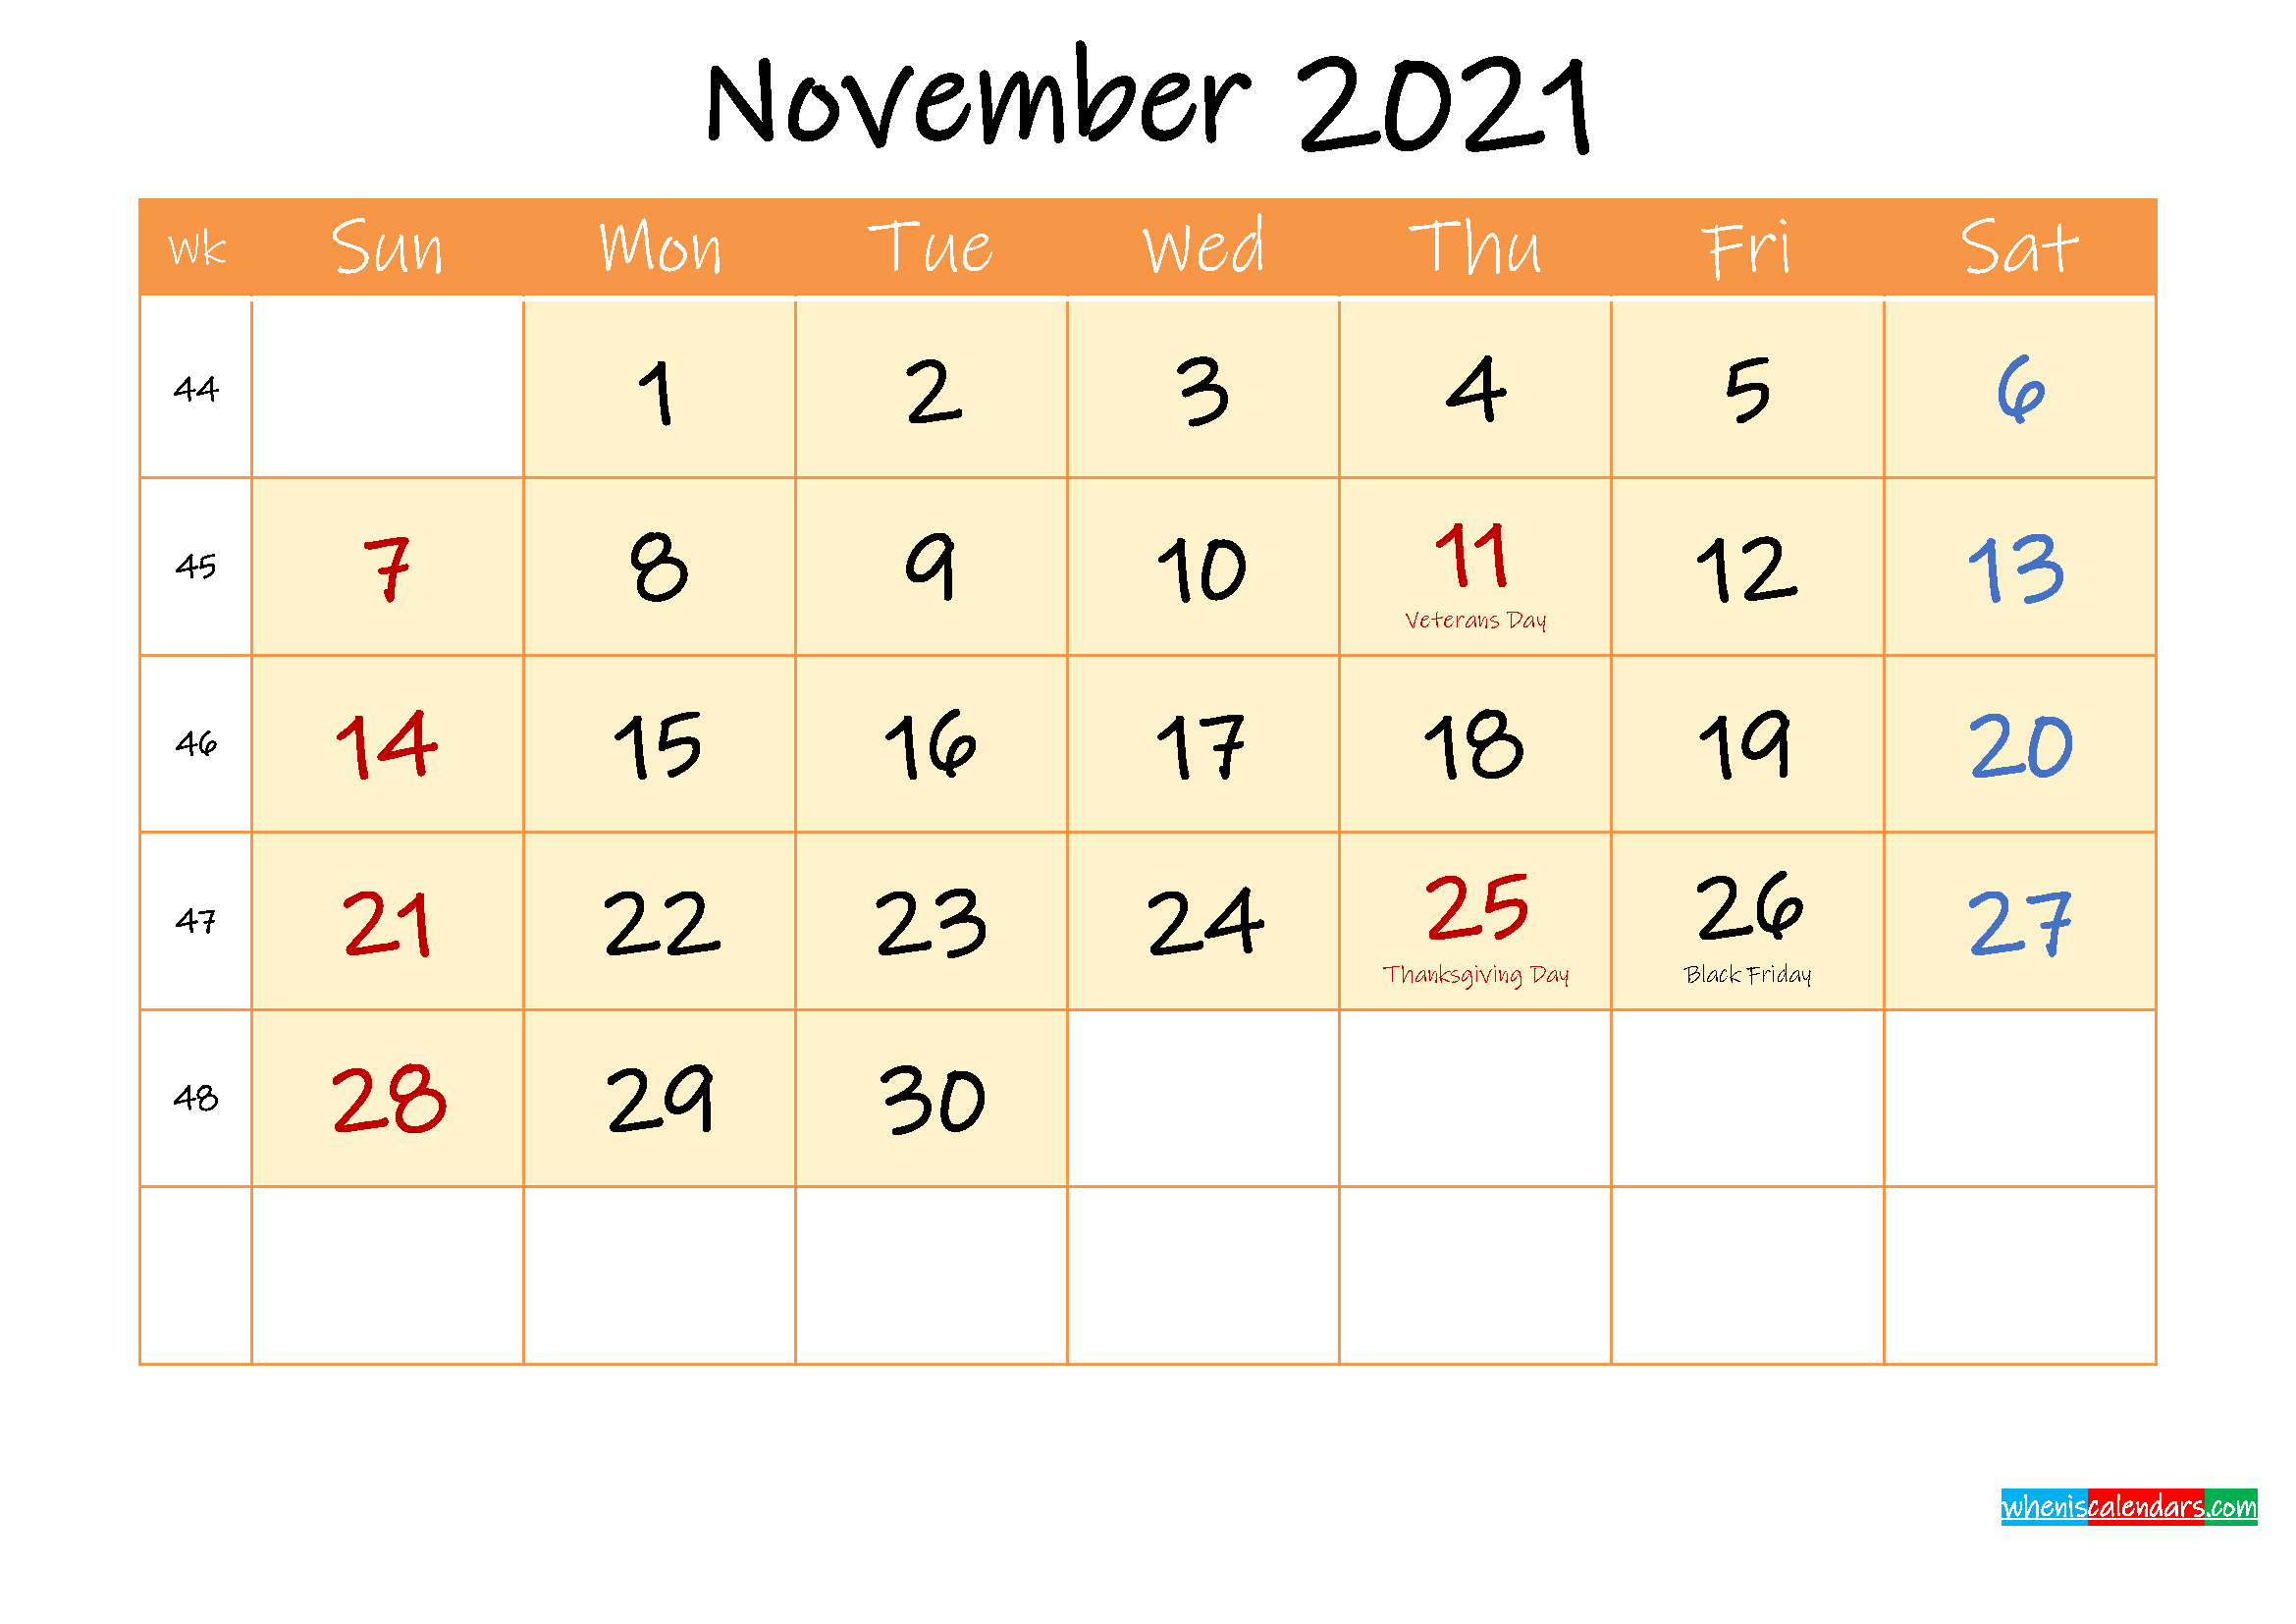 November 2021 Free Printable Calendar - Template Ink21M167